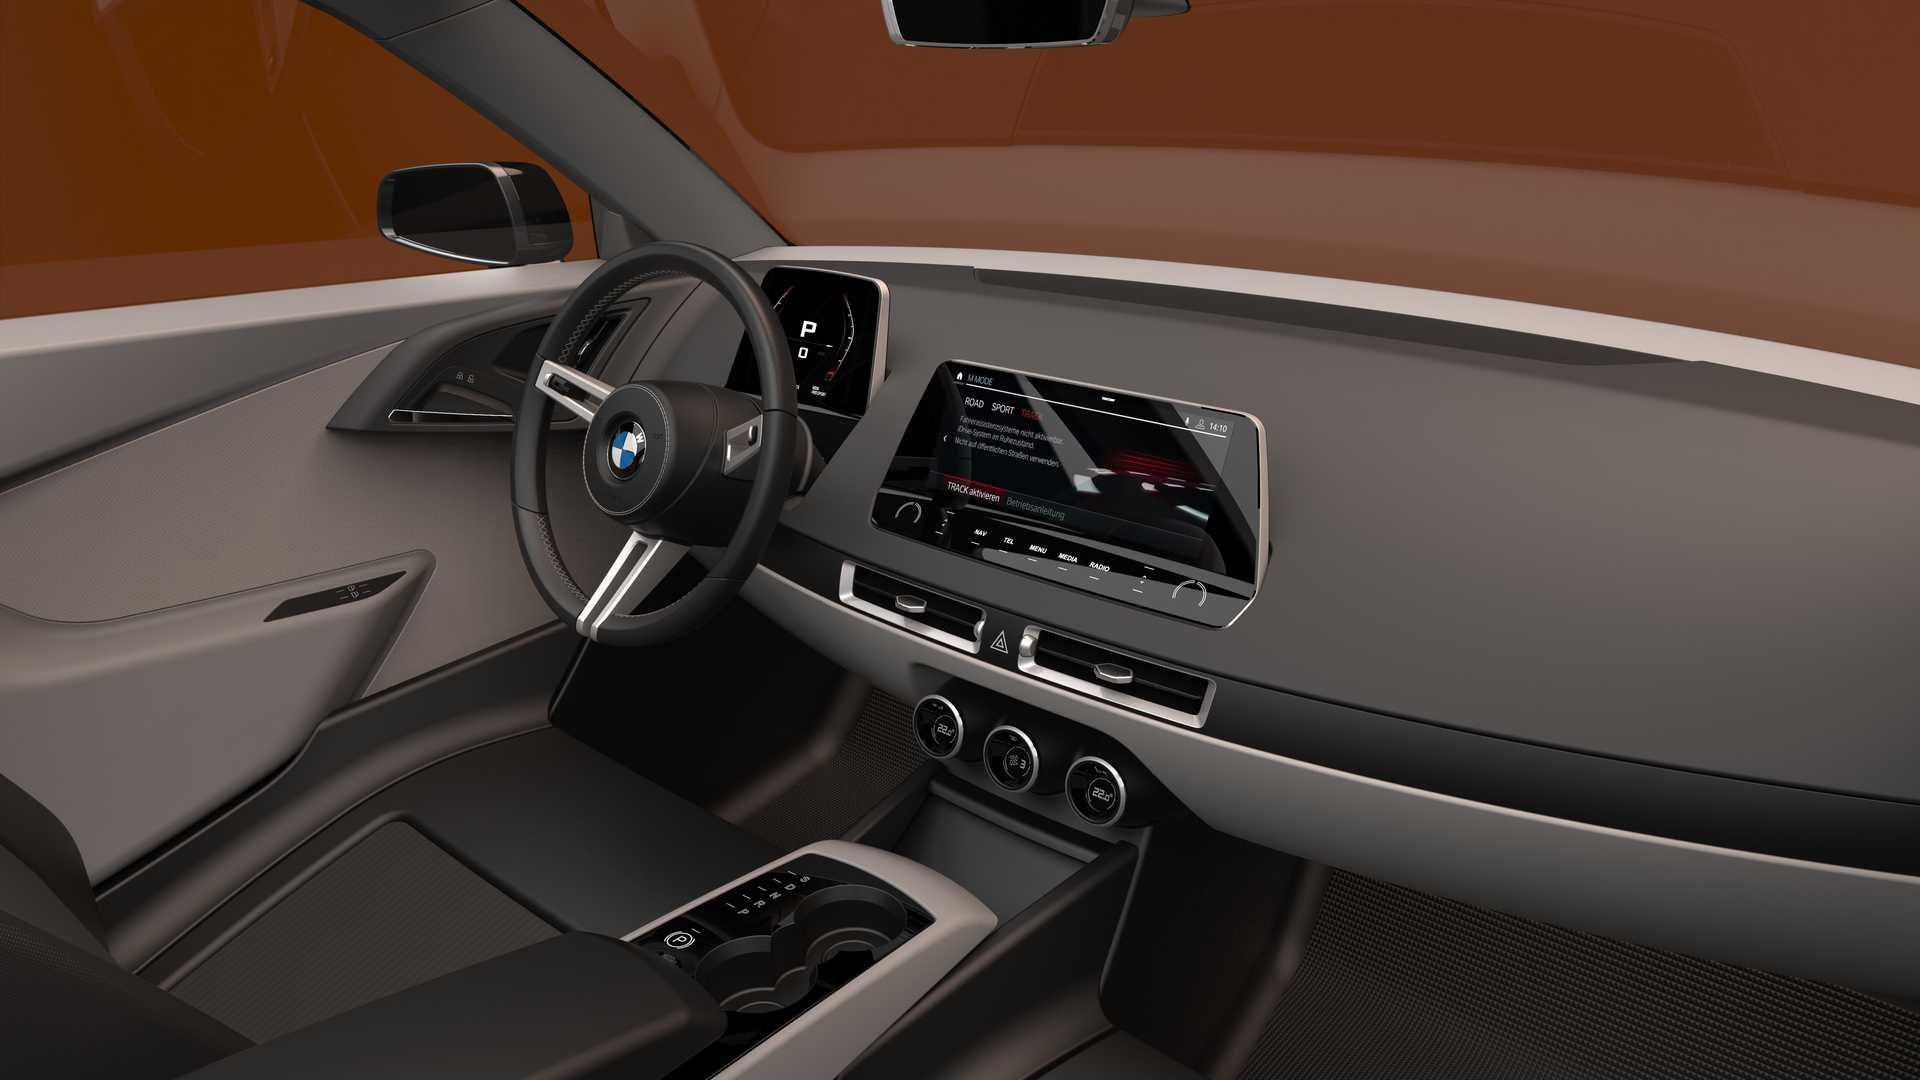 BMW 02 Reminicance